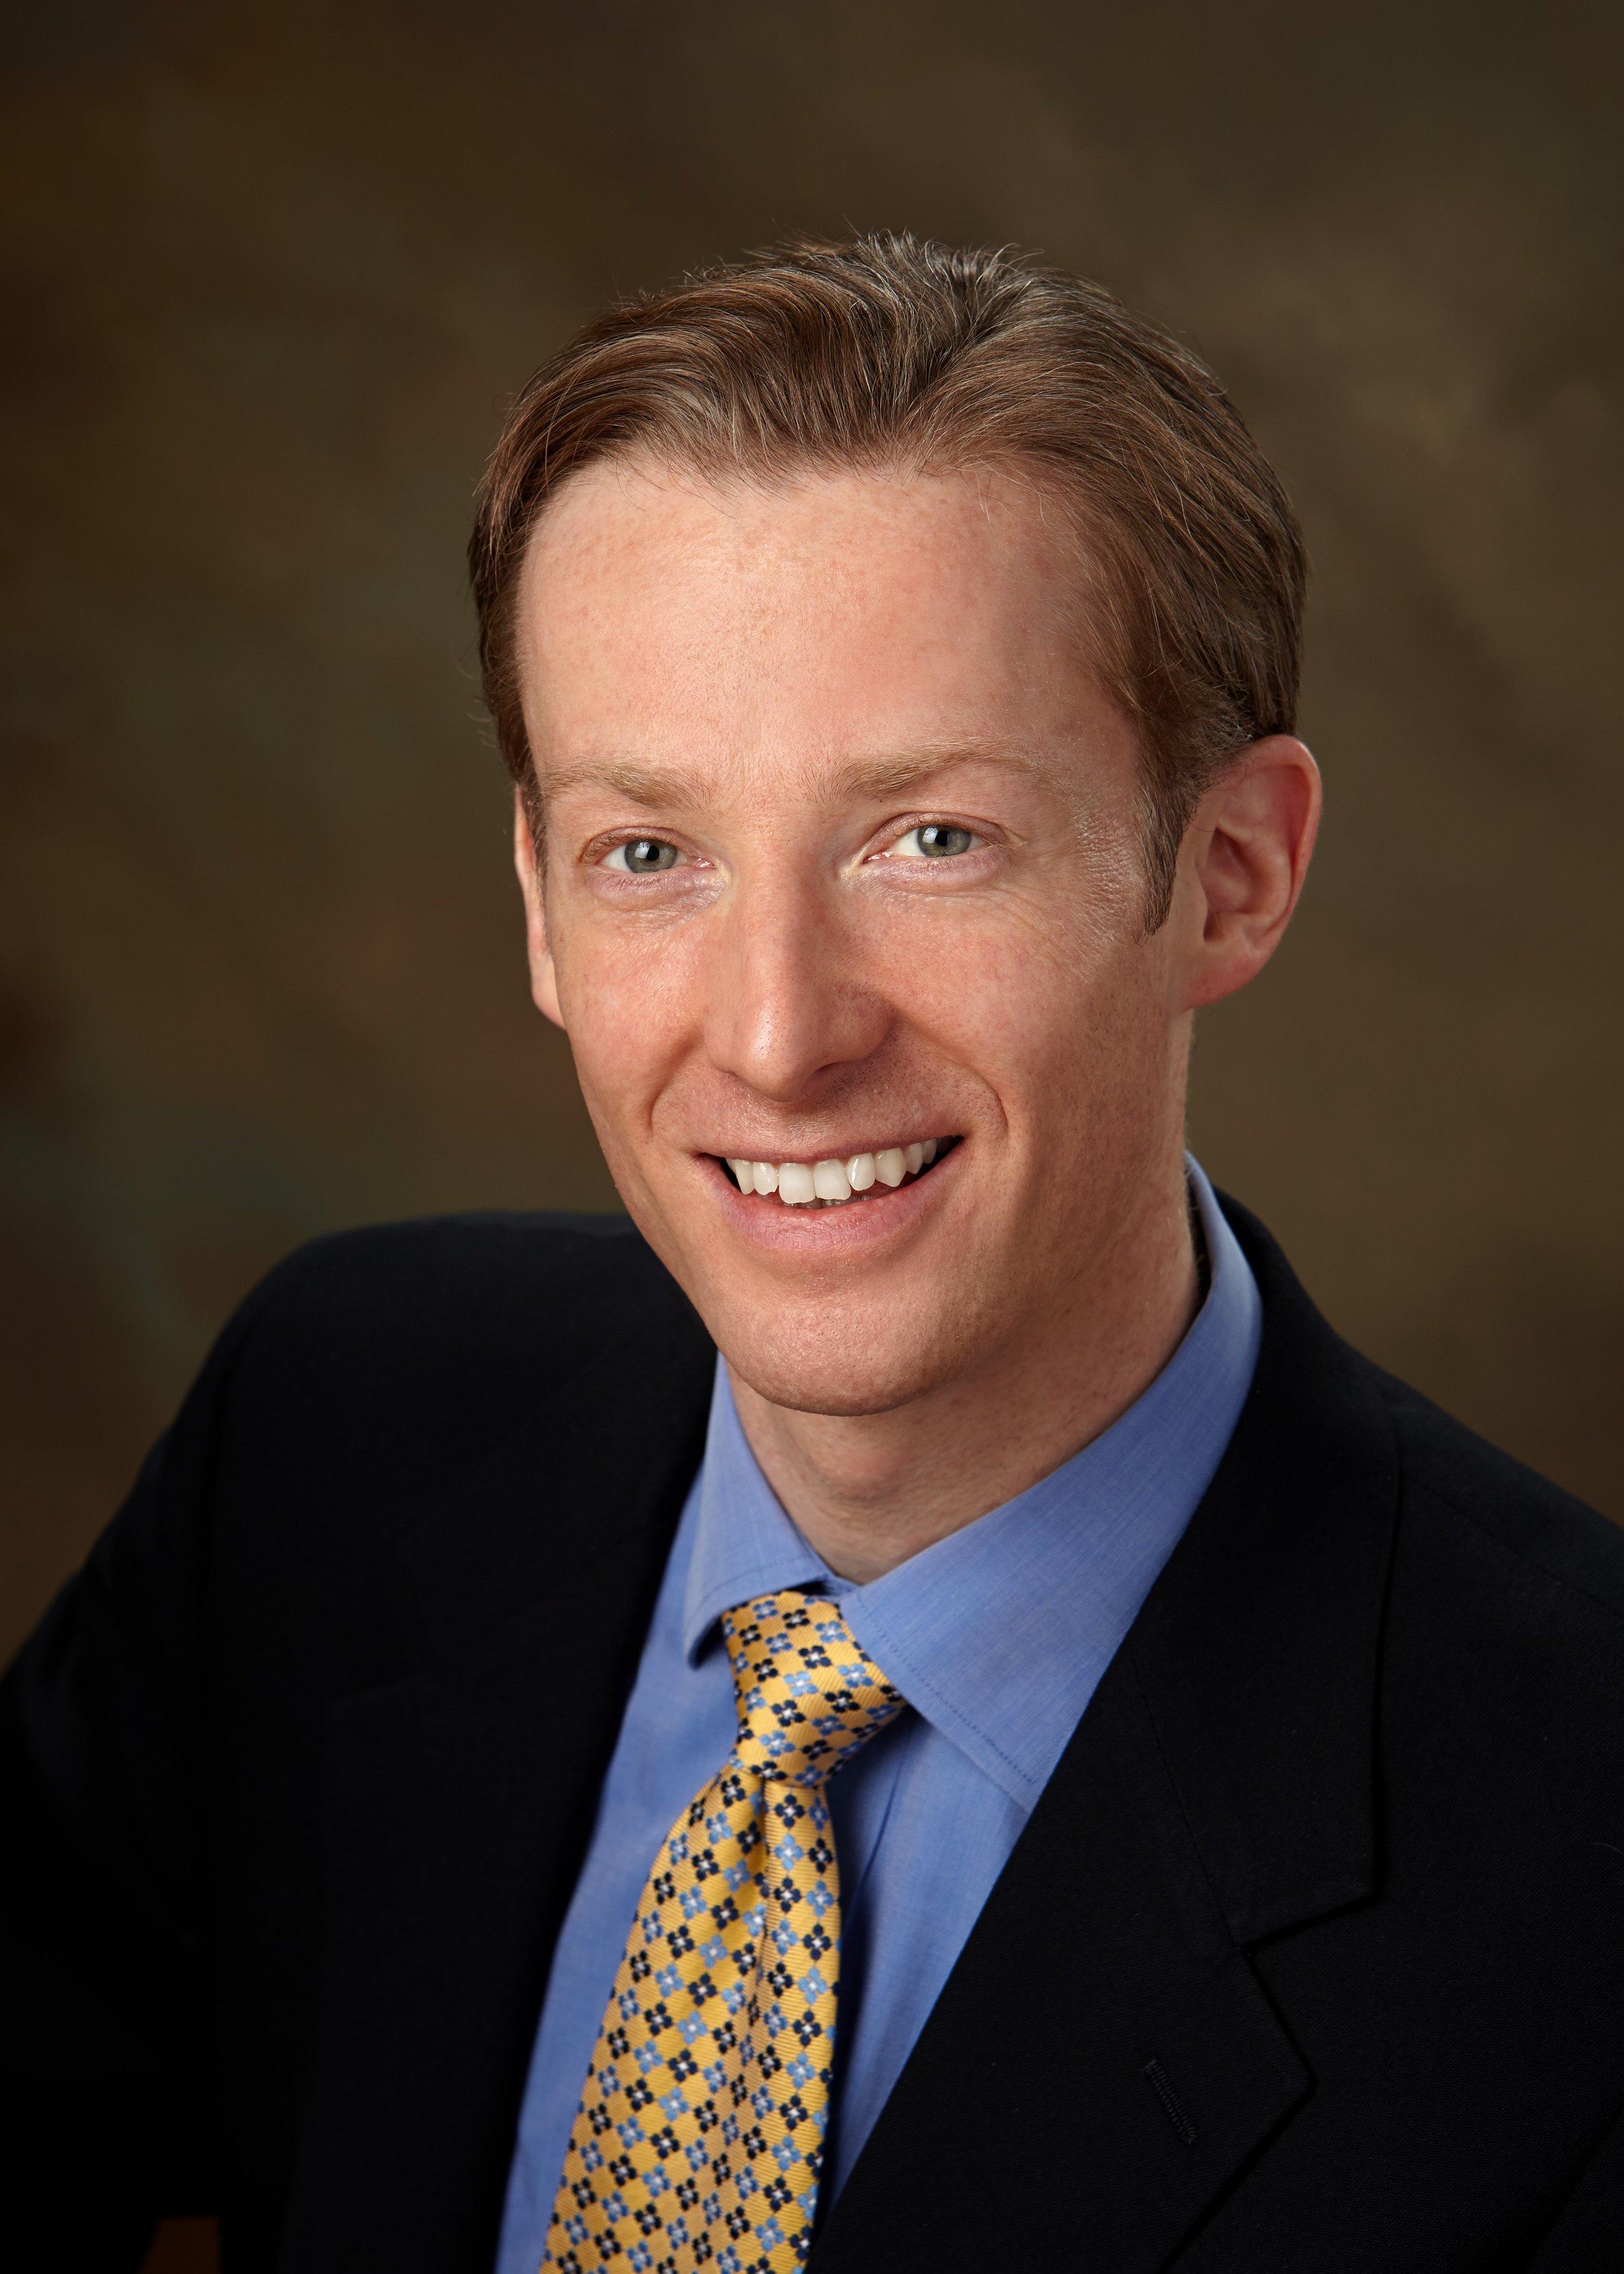 Ryan D. Taliaferro, Ph.D.